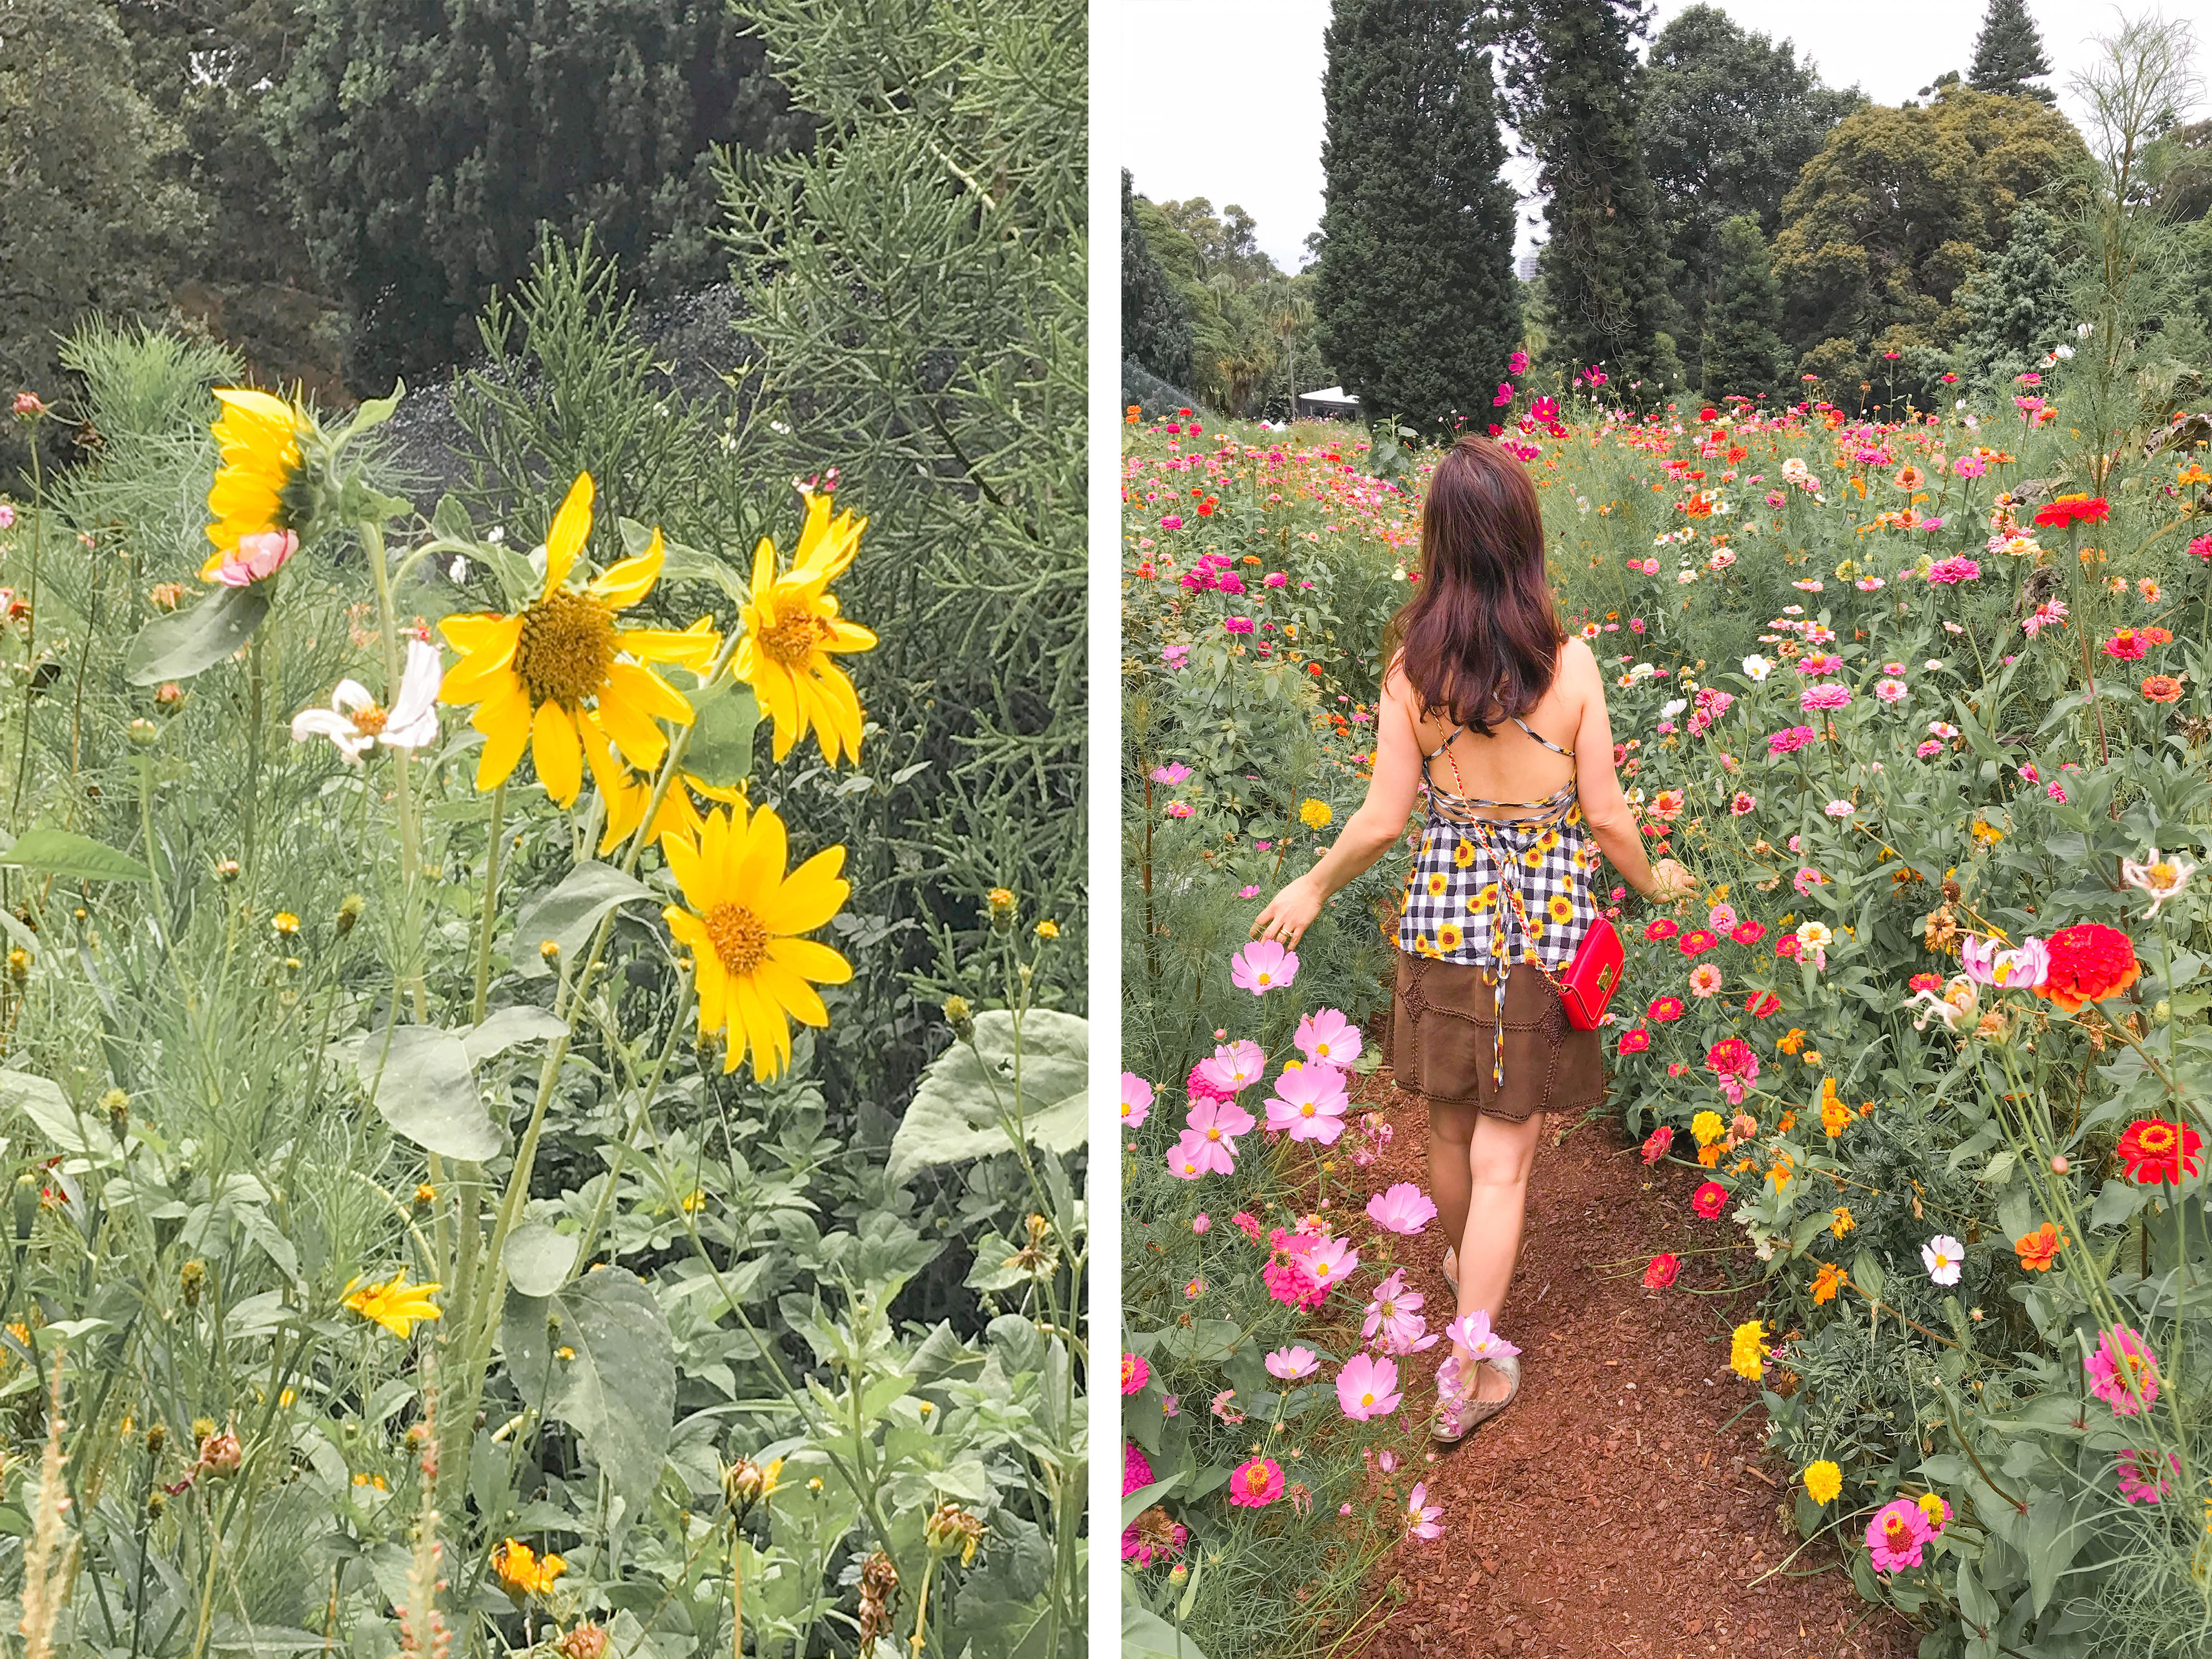 The Meadow Sydney Botanic Garden